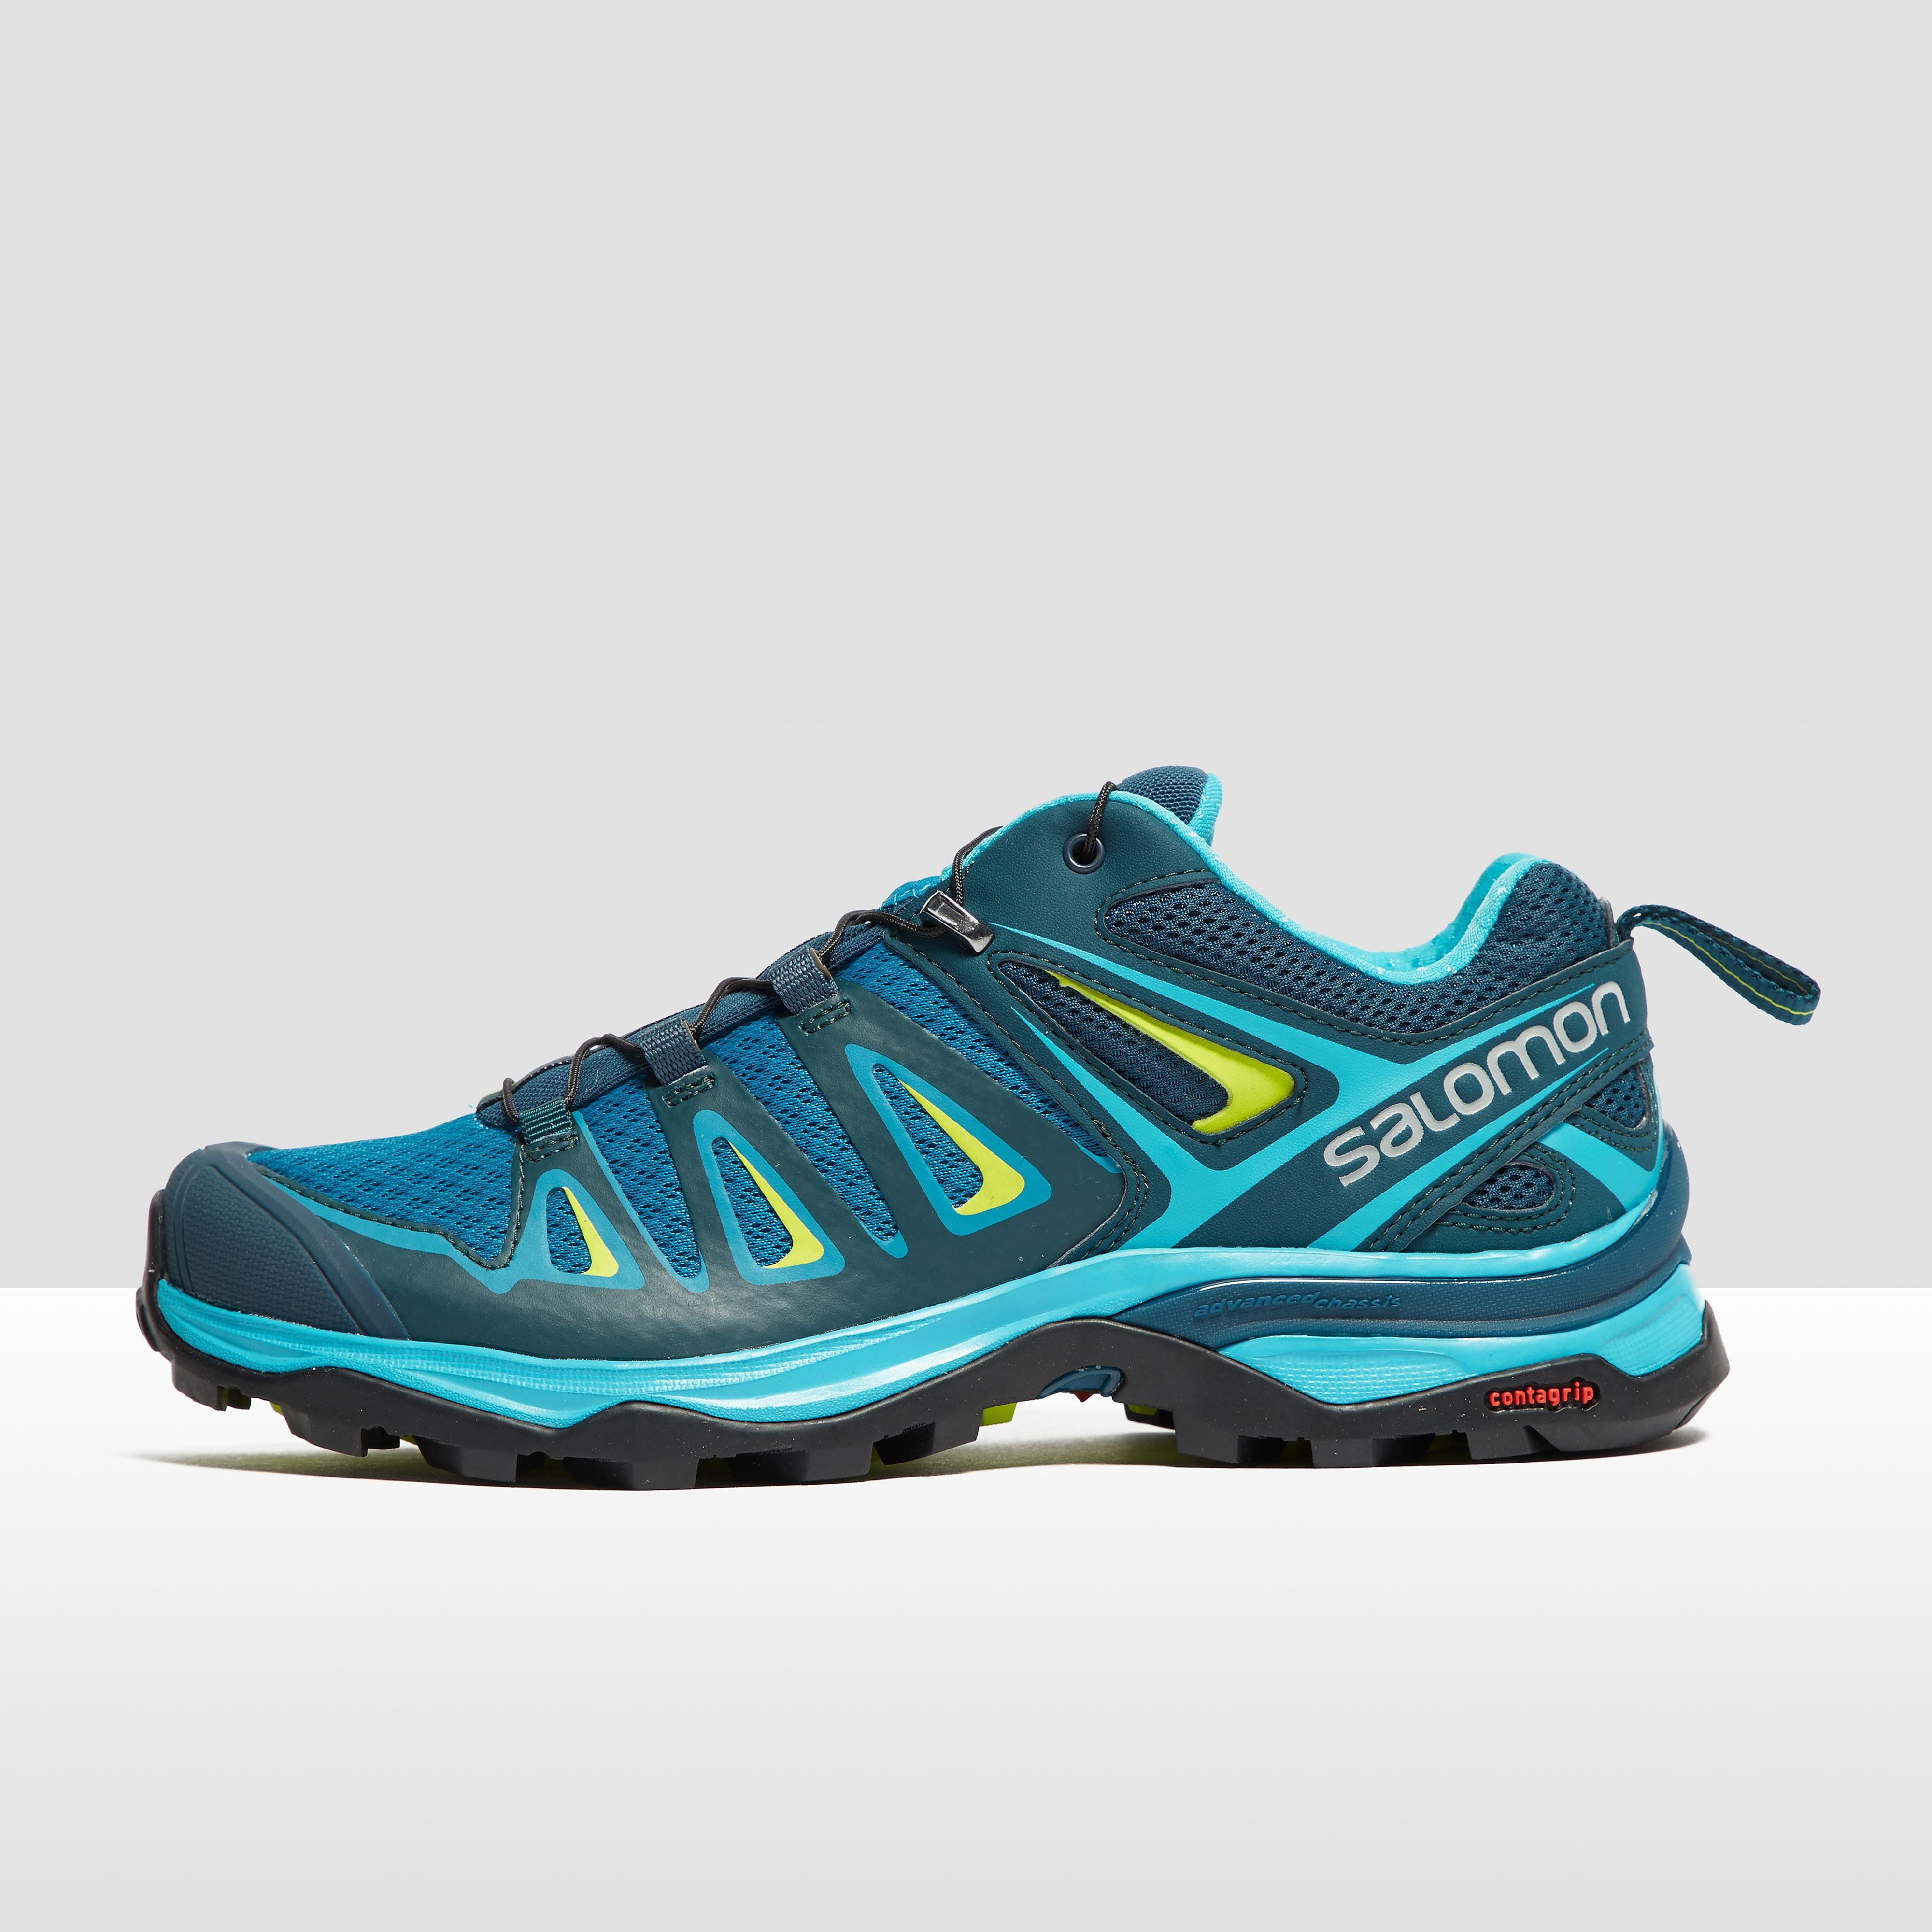 Salomon X ULTRA 3 Women's Walking Shoes